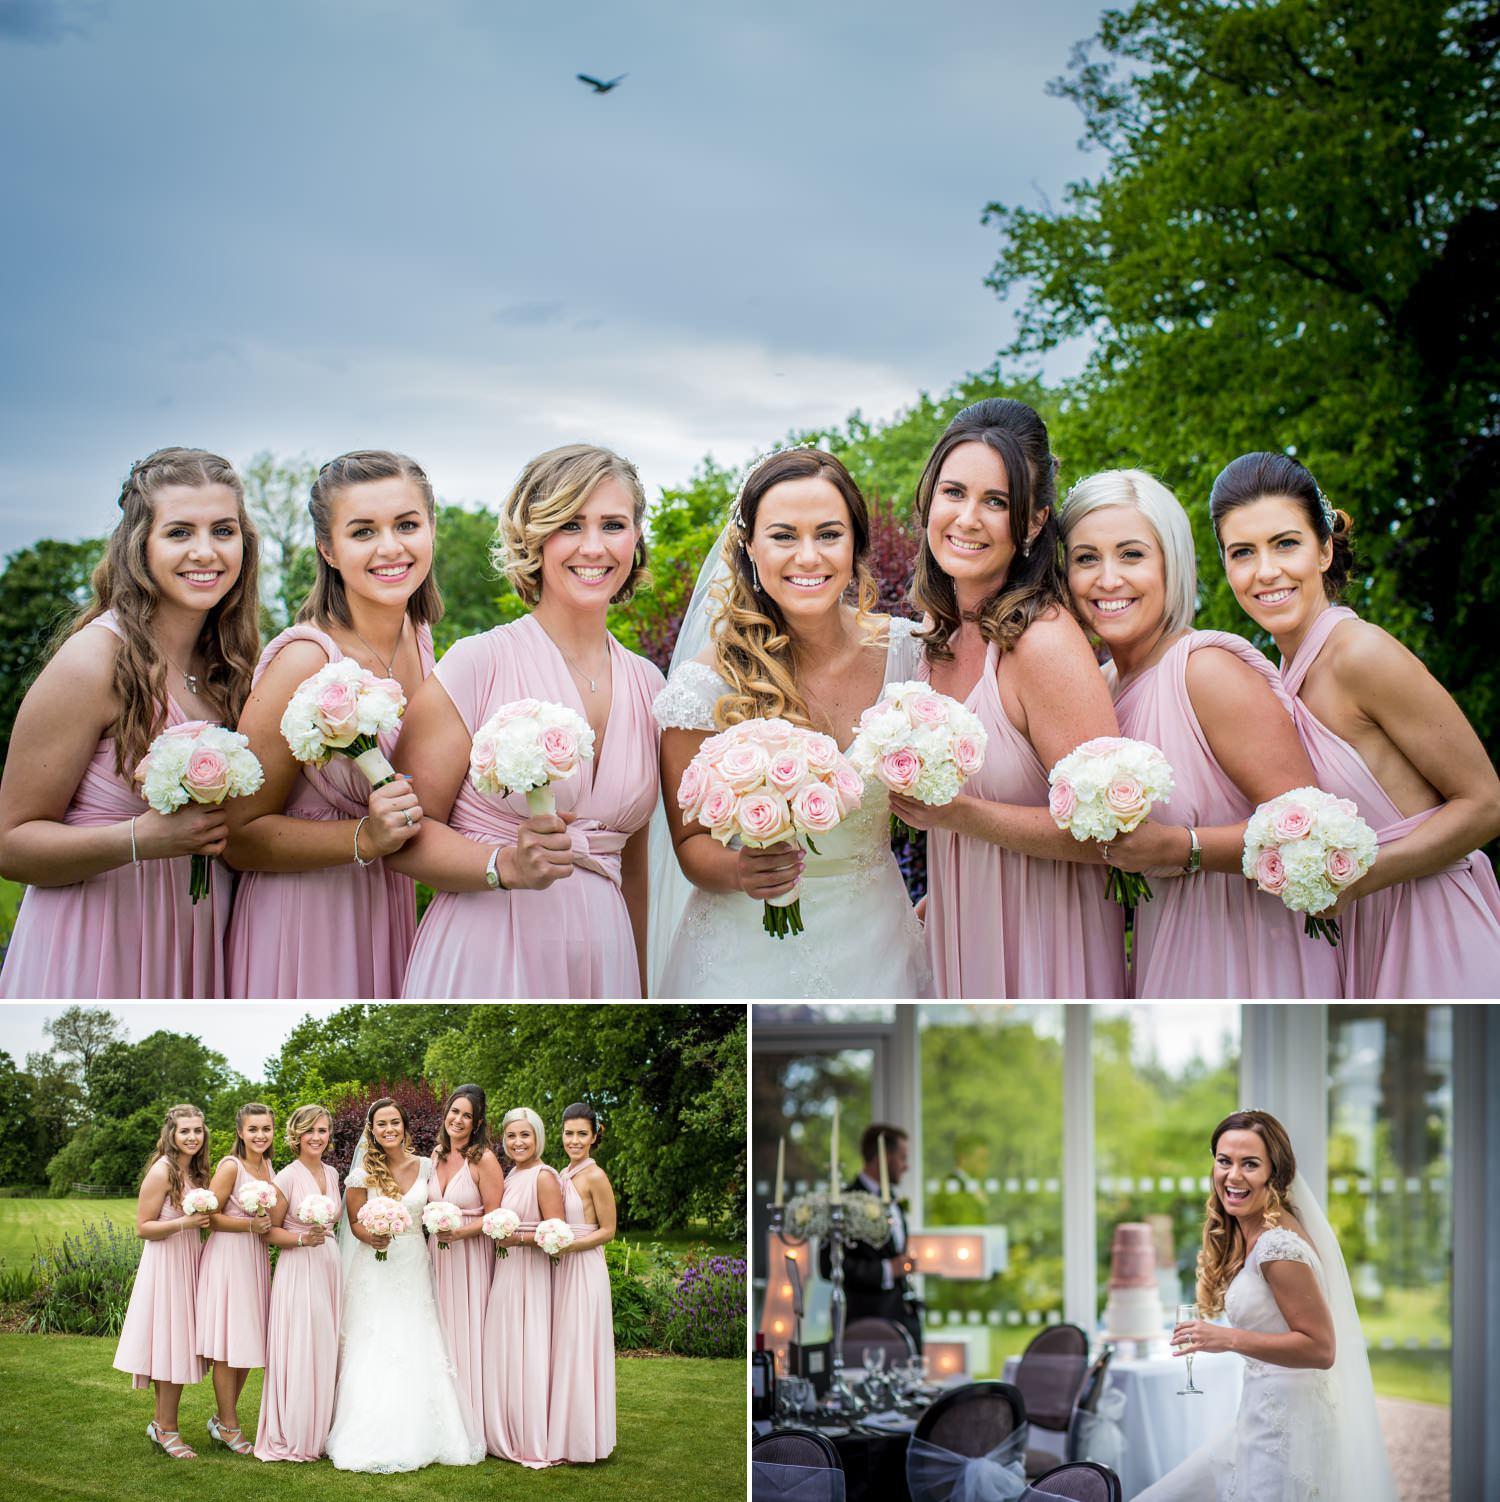 Wedding Photography Shropshire, photographs of bridesmaids